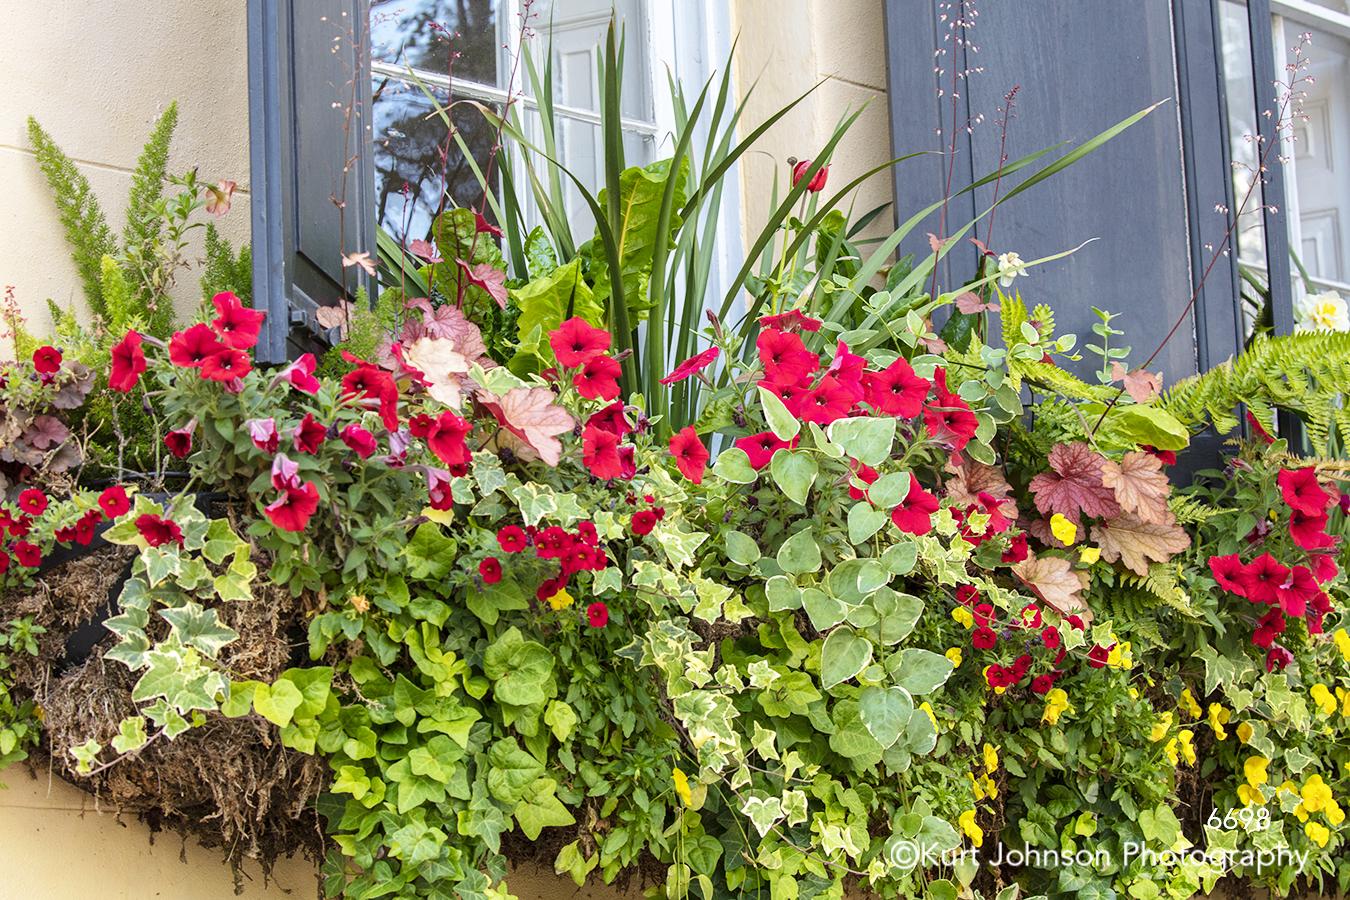 southeast Charleston South Carolina green red flowers window windowsill city